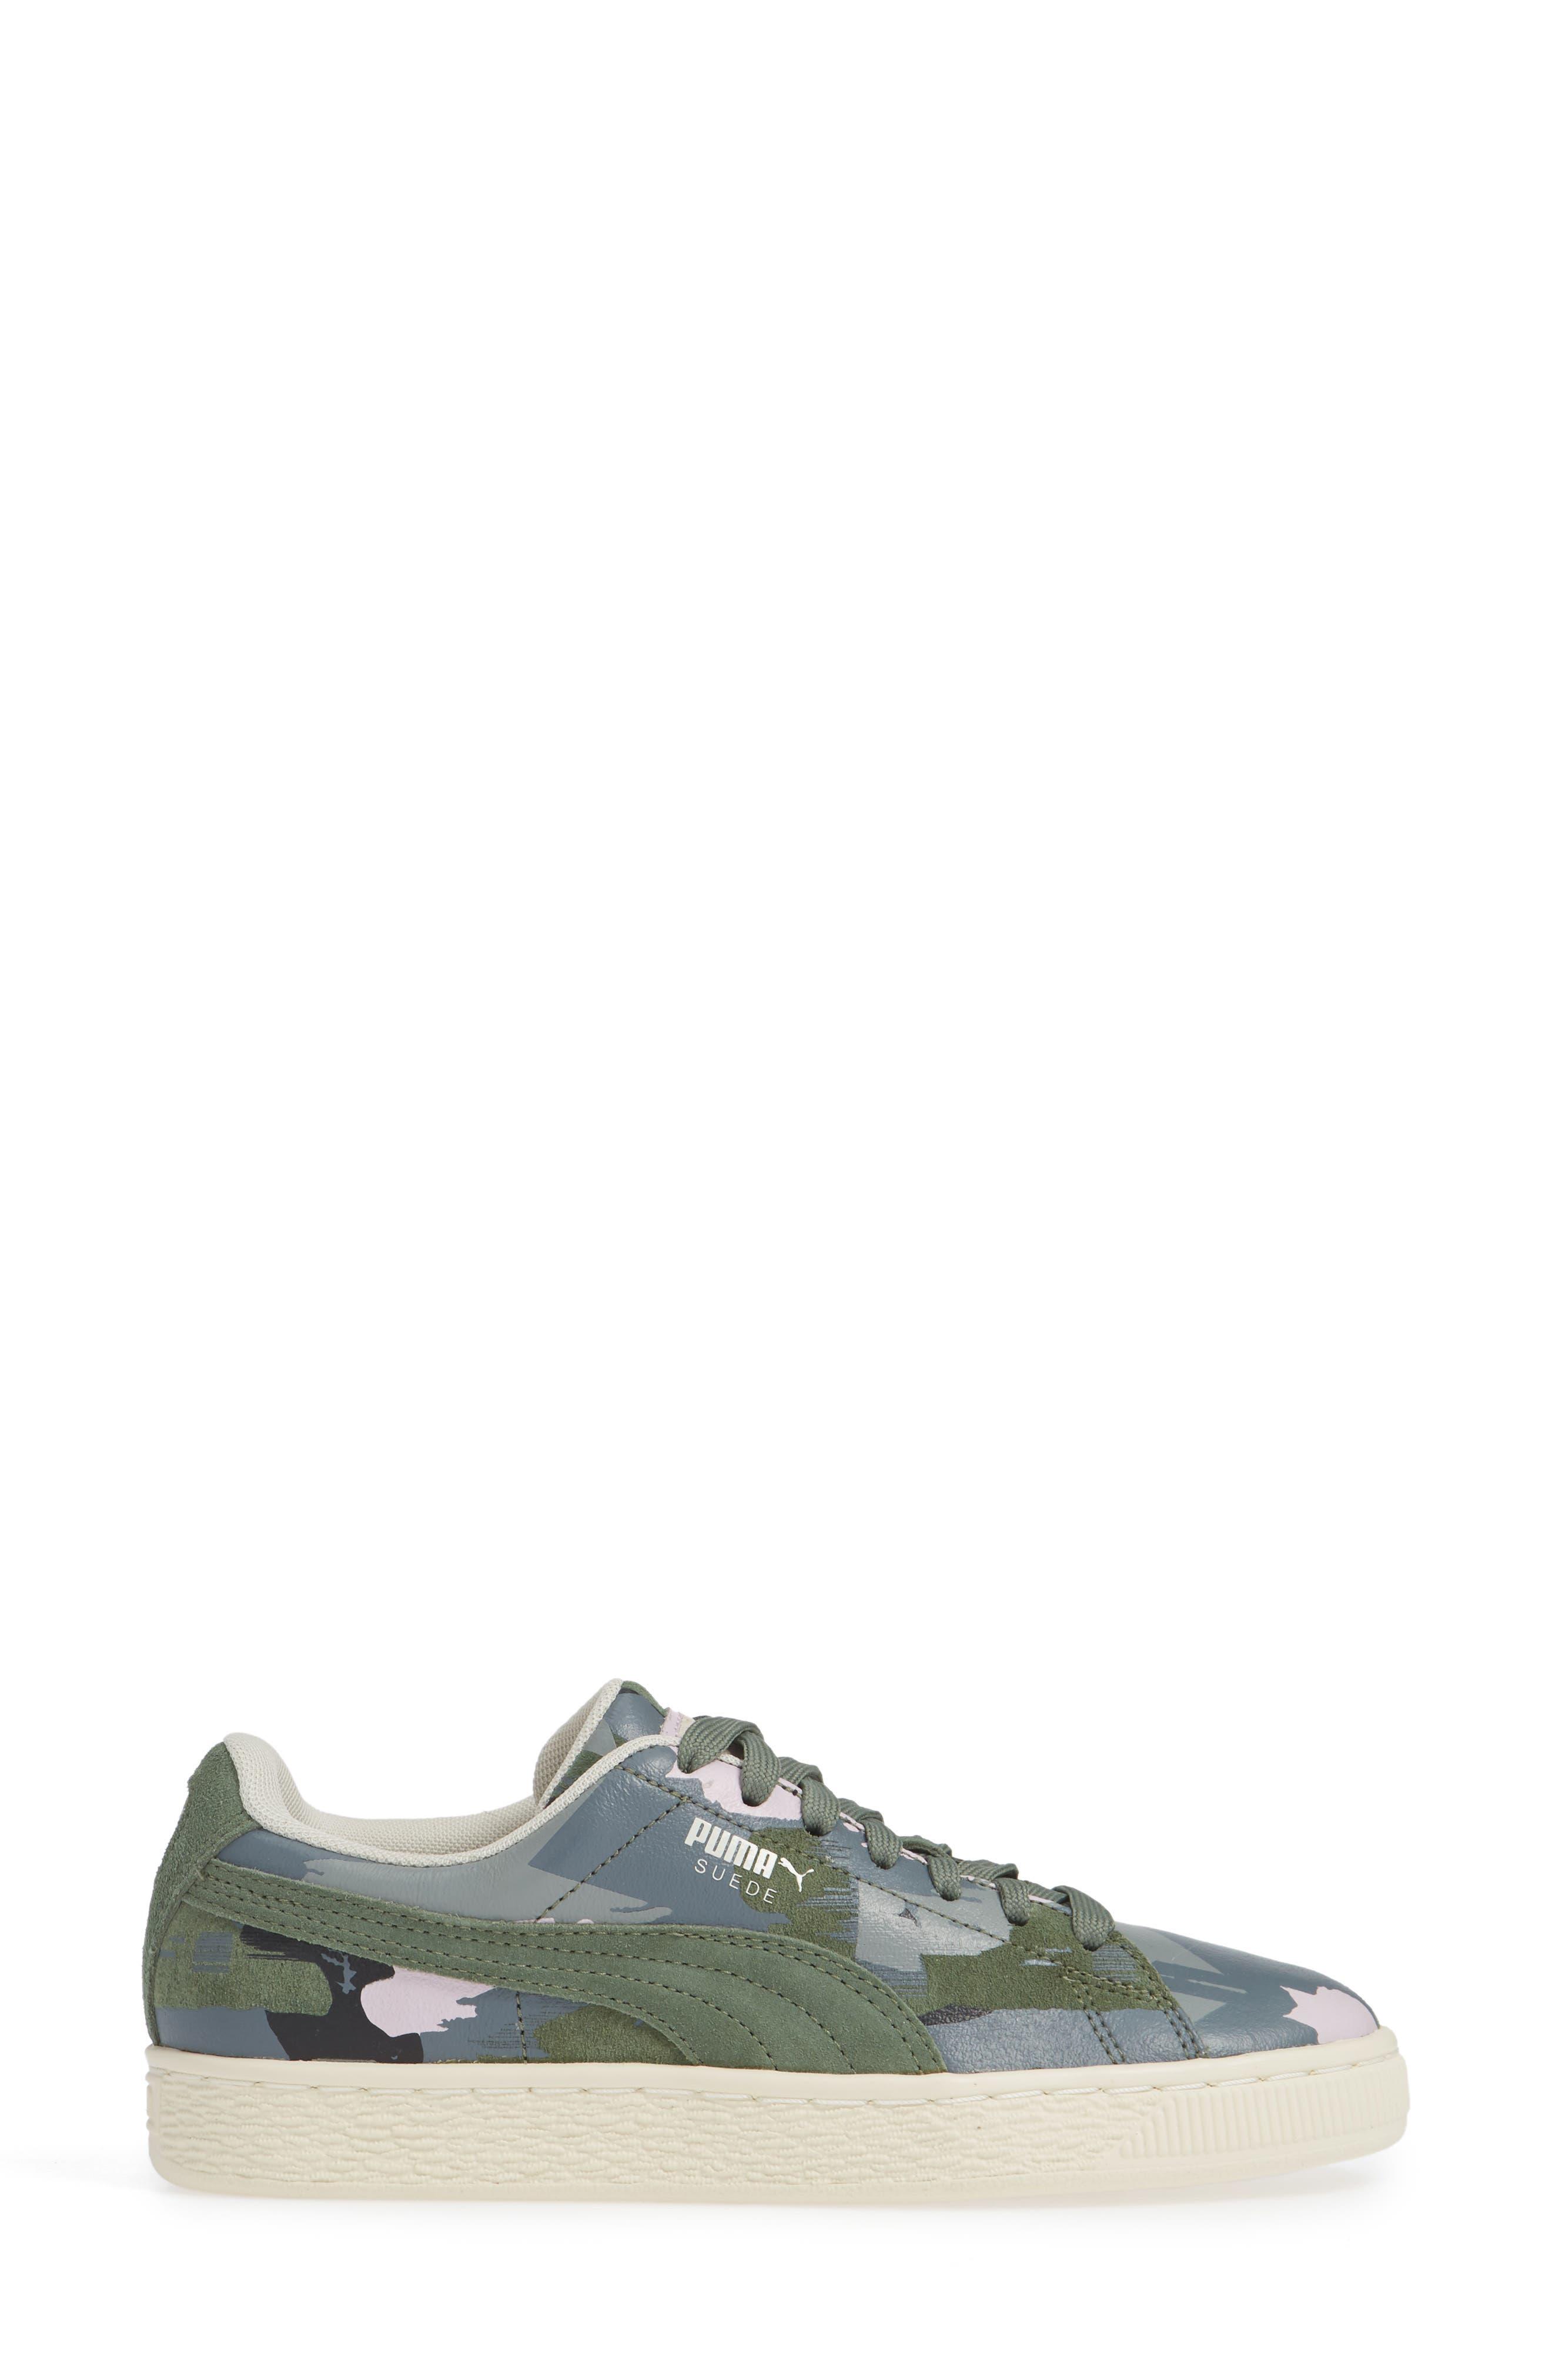 'Suede Classic' Sneaker,                             Alternate thumbnail 4, color,                             Laurel Wreath-White-Orchid